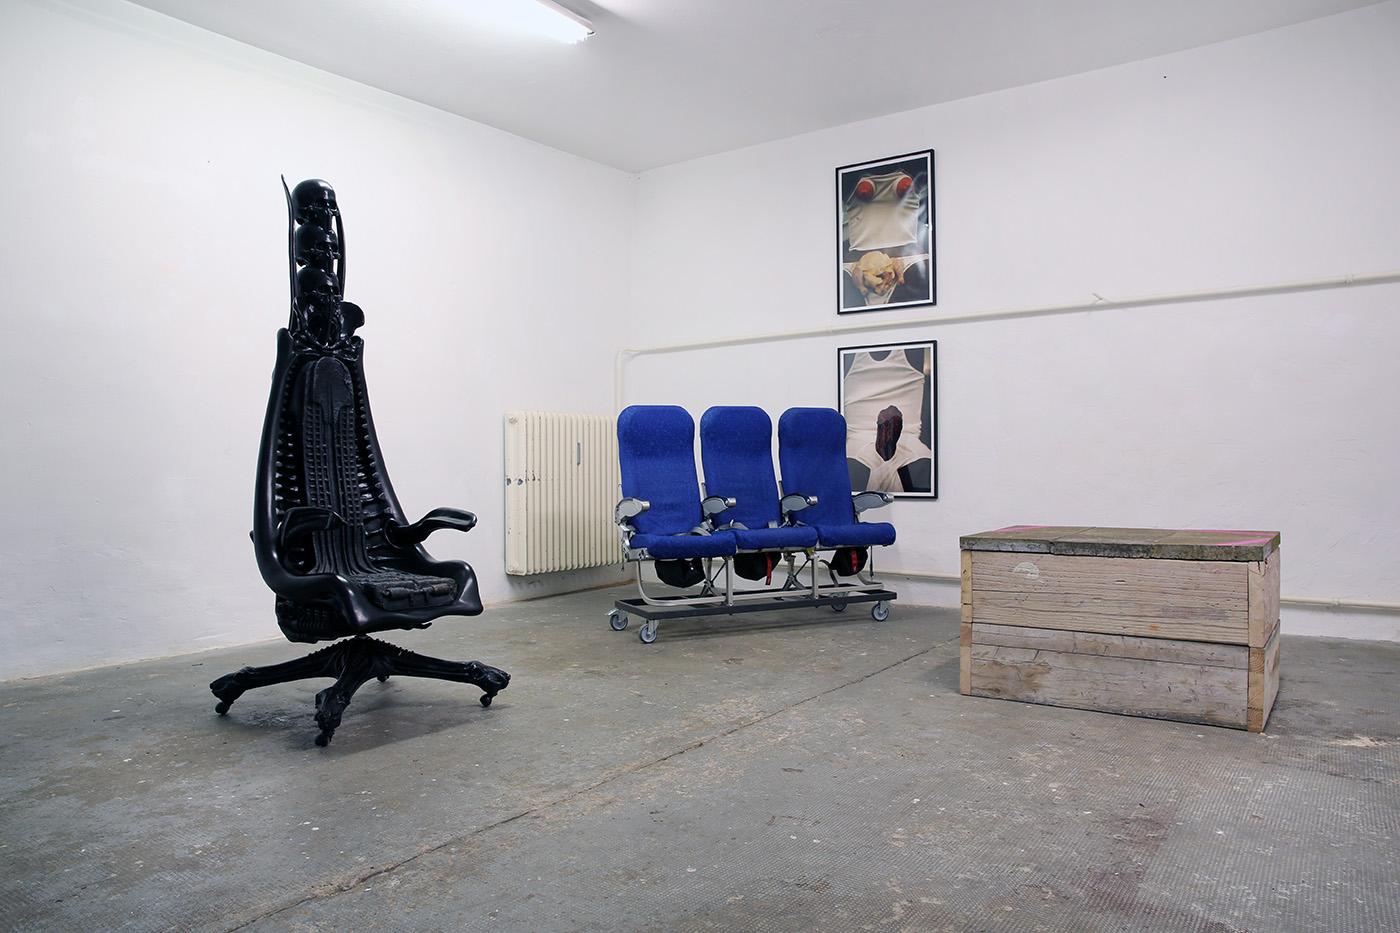 Installation View, Sitting Bone at Mavra